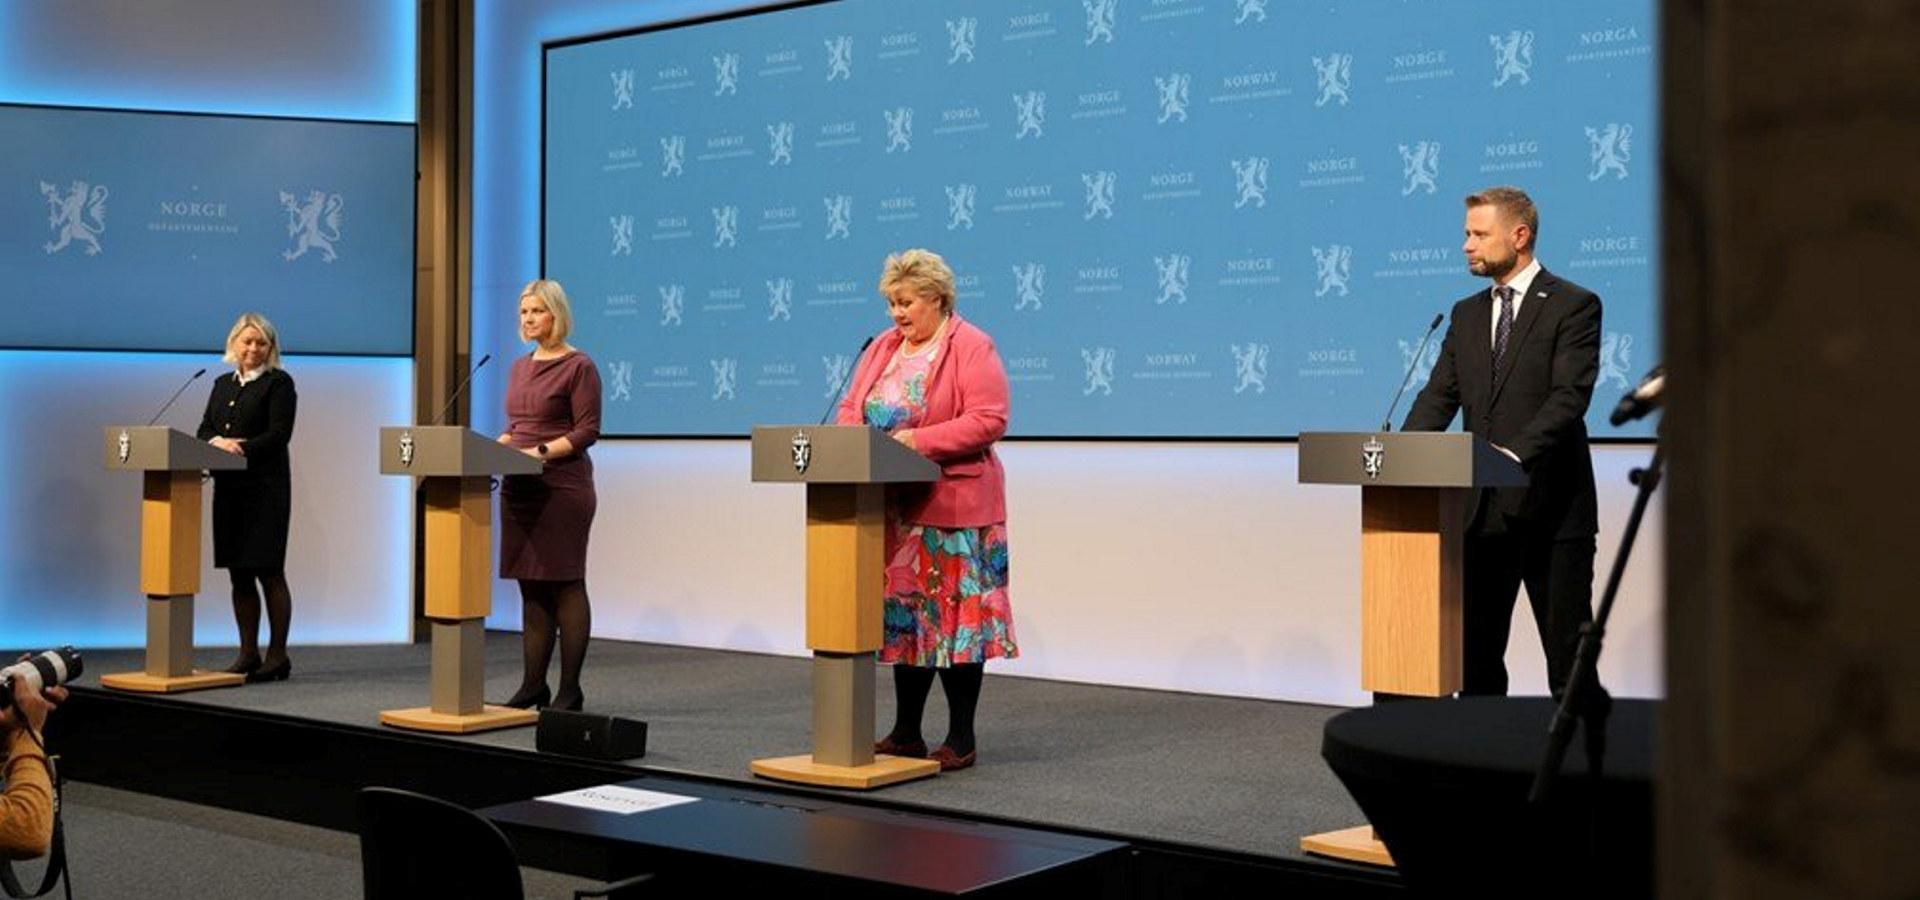 Fra regjeringens pressekonferanse 24. september 2021. Foto: regjeringen.no